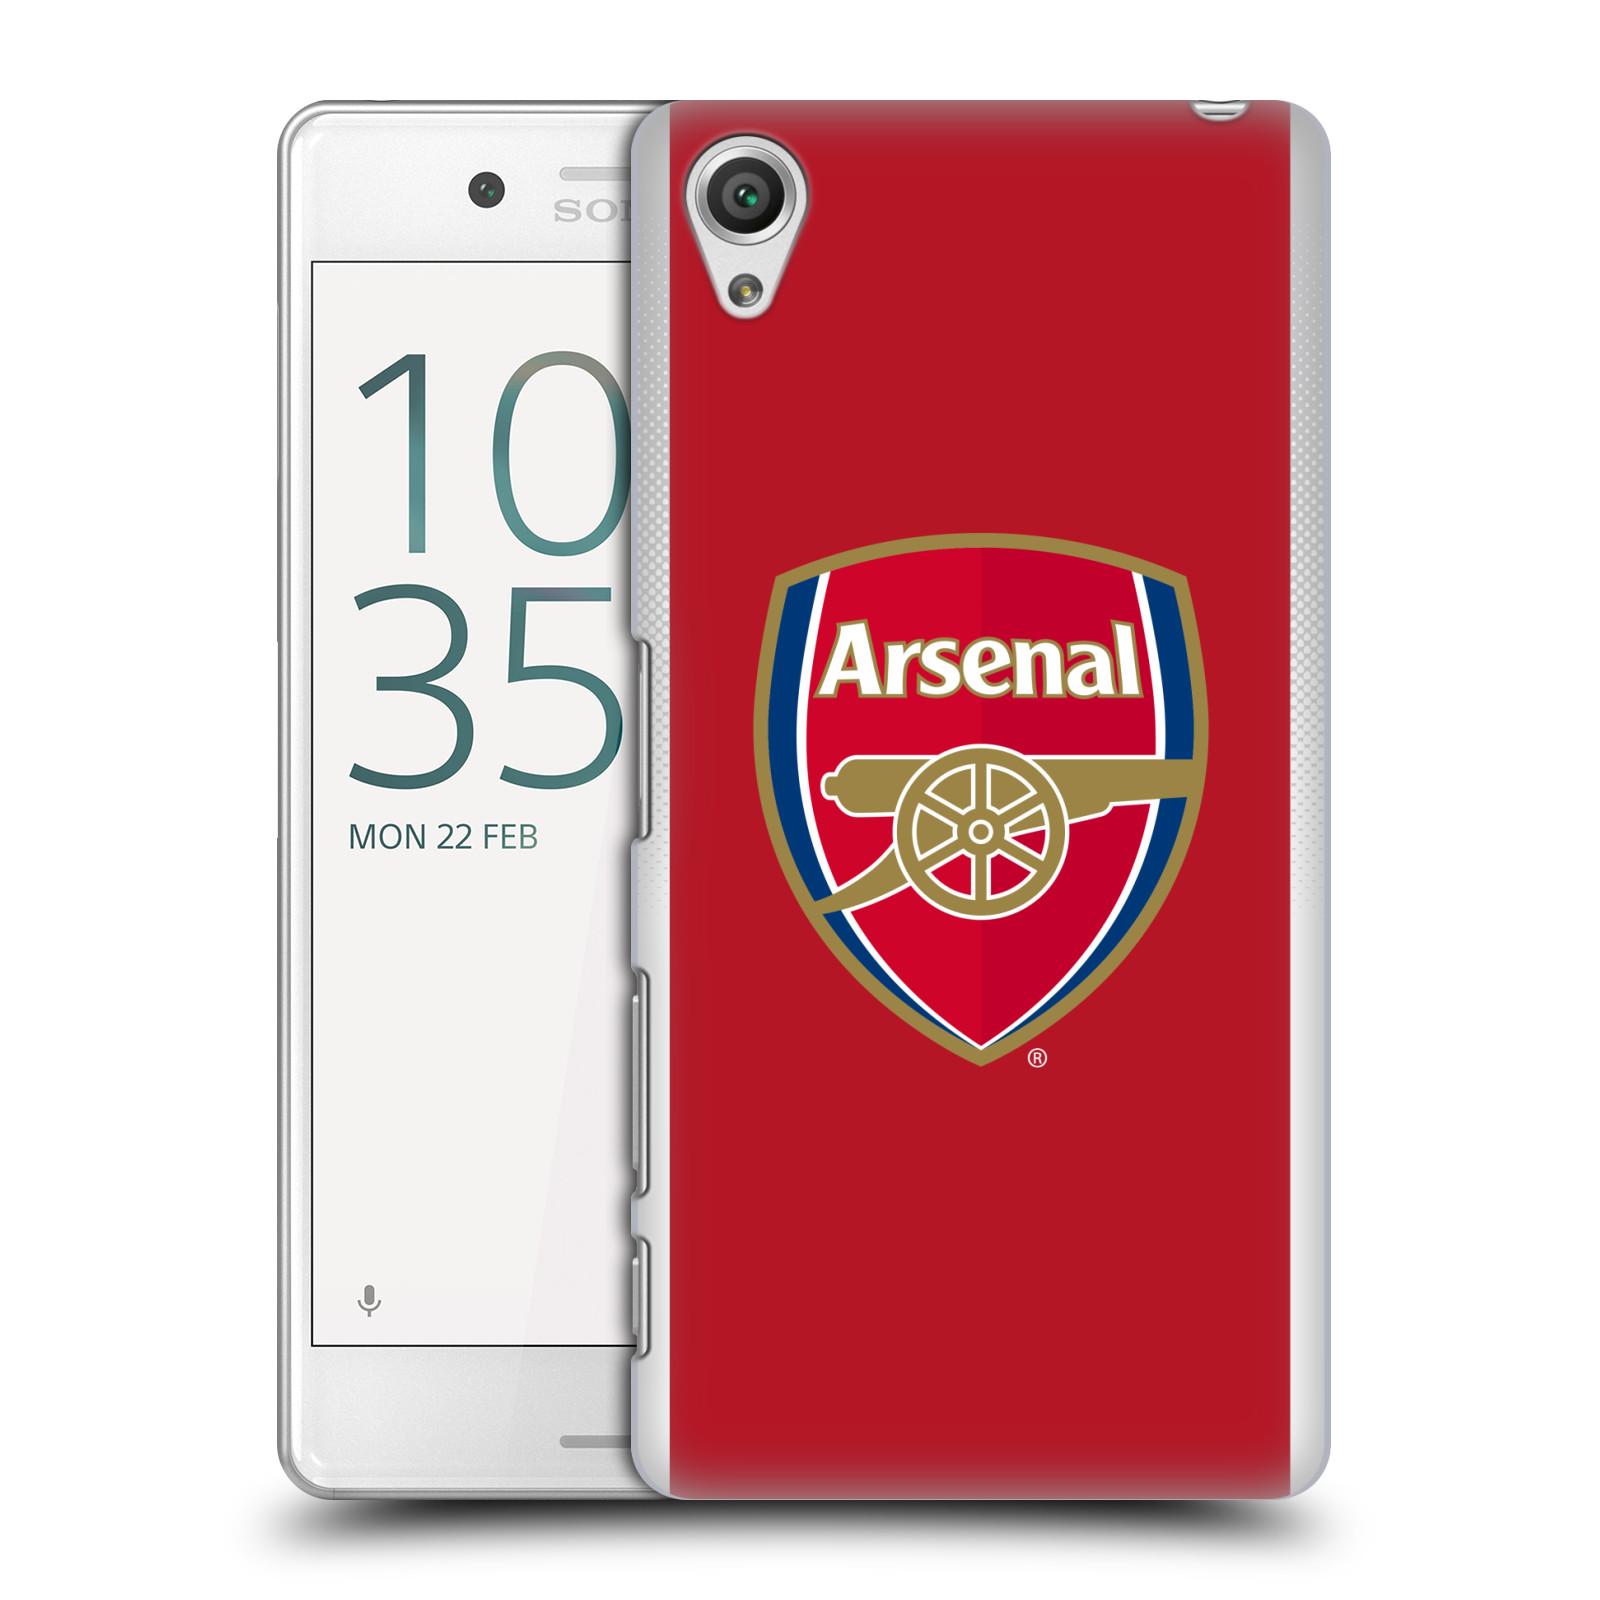 Plastové pouzdro na mobil Sony Xperia X Performance - Head Case - Arsenal FC - Logo klubu